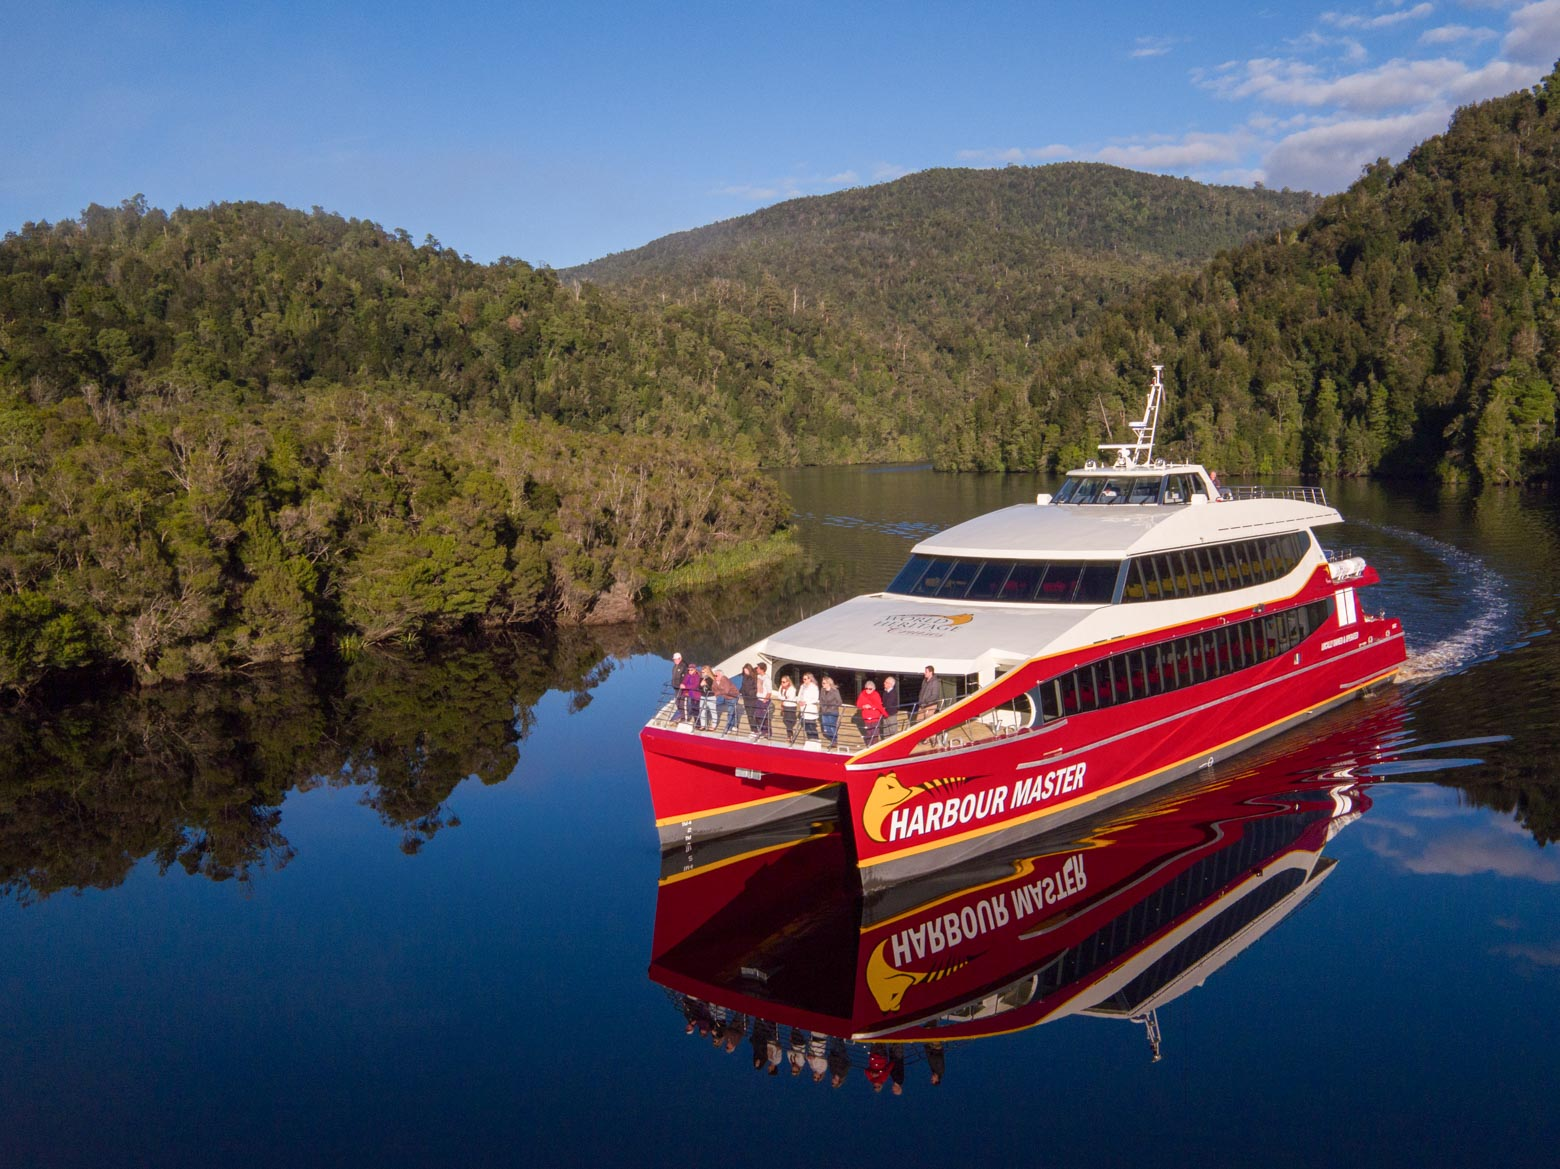 Tasmania Itinerary 7 Days Your Tassie Whirlwind Road